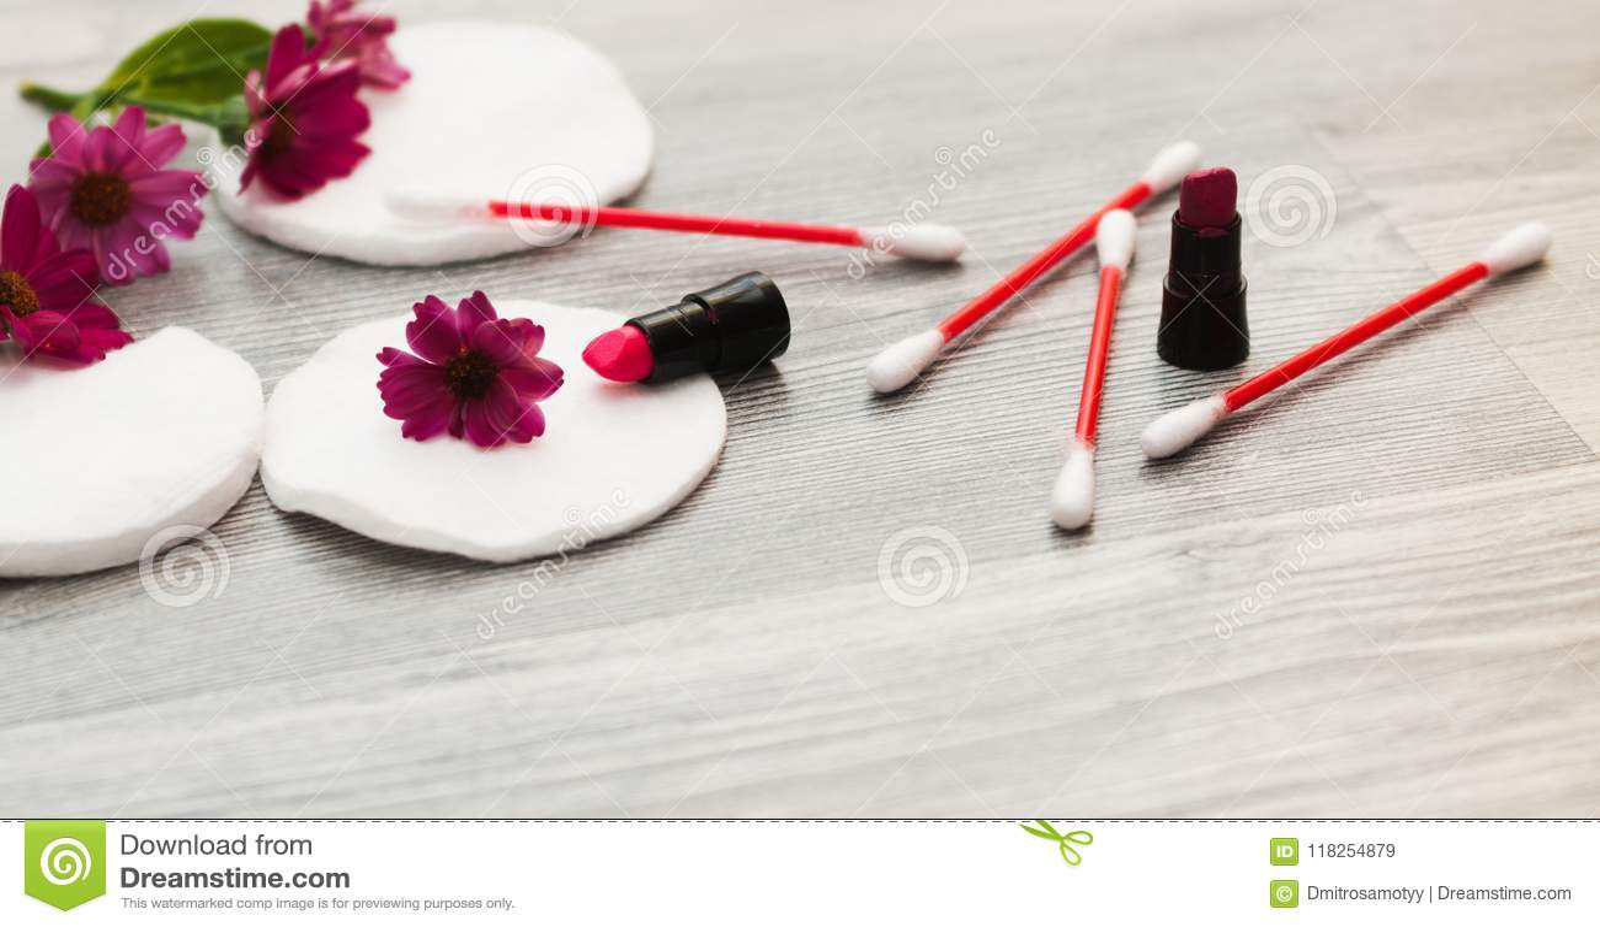 Image Of Homemade Cosmetics Ingredients  Aroma Theme  Cotton Sponges